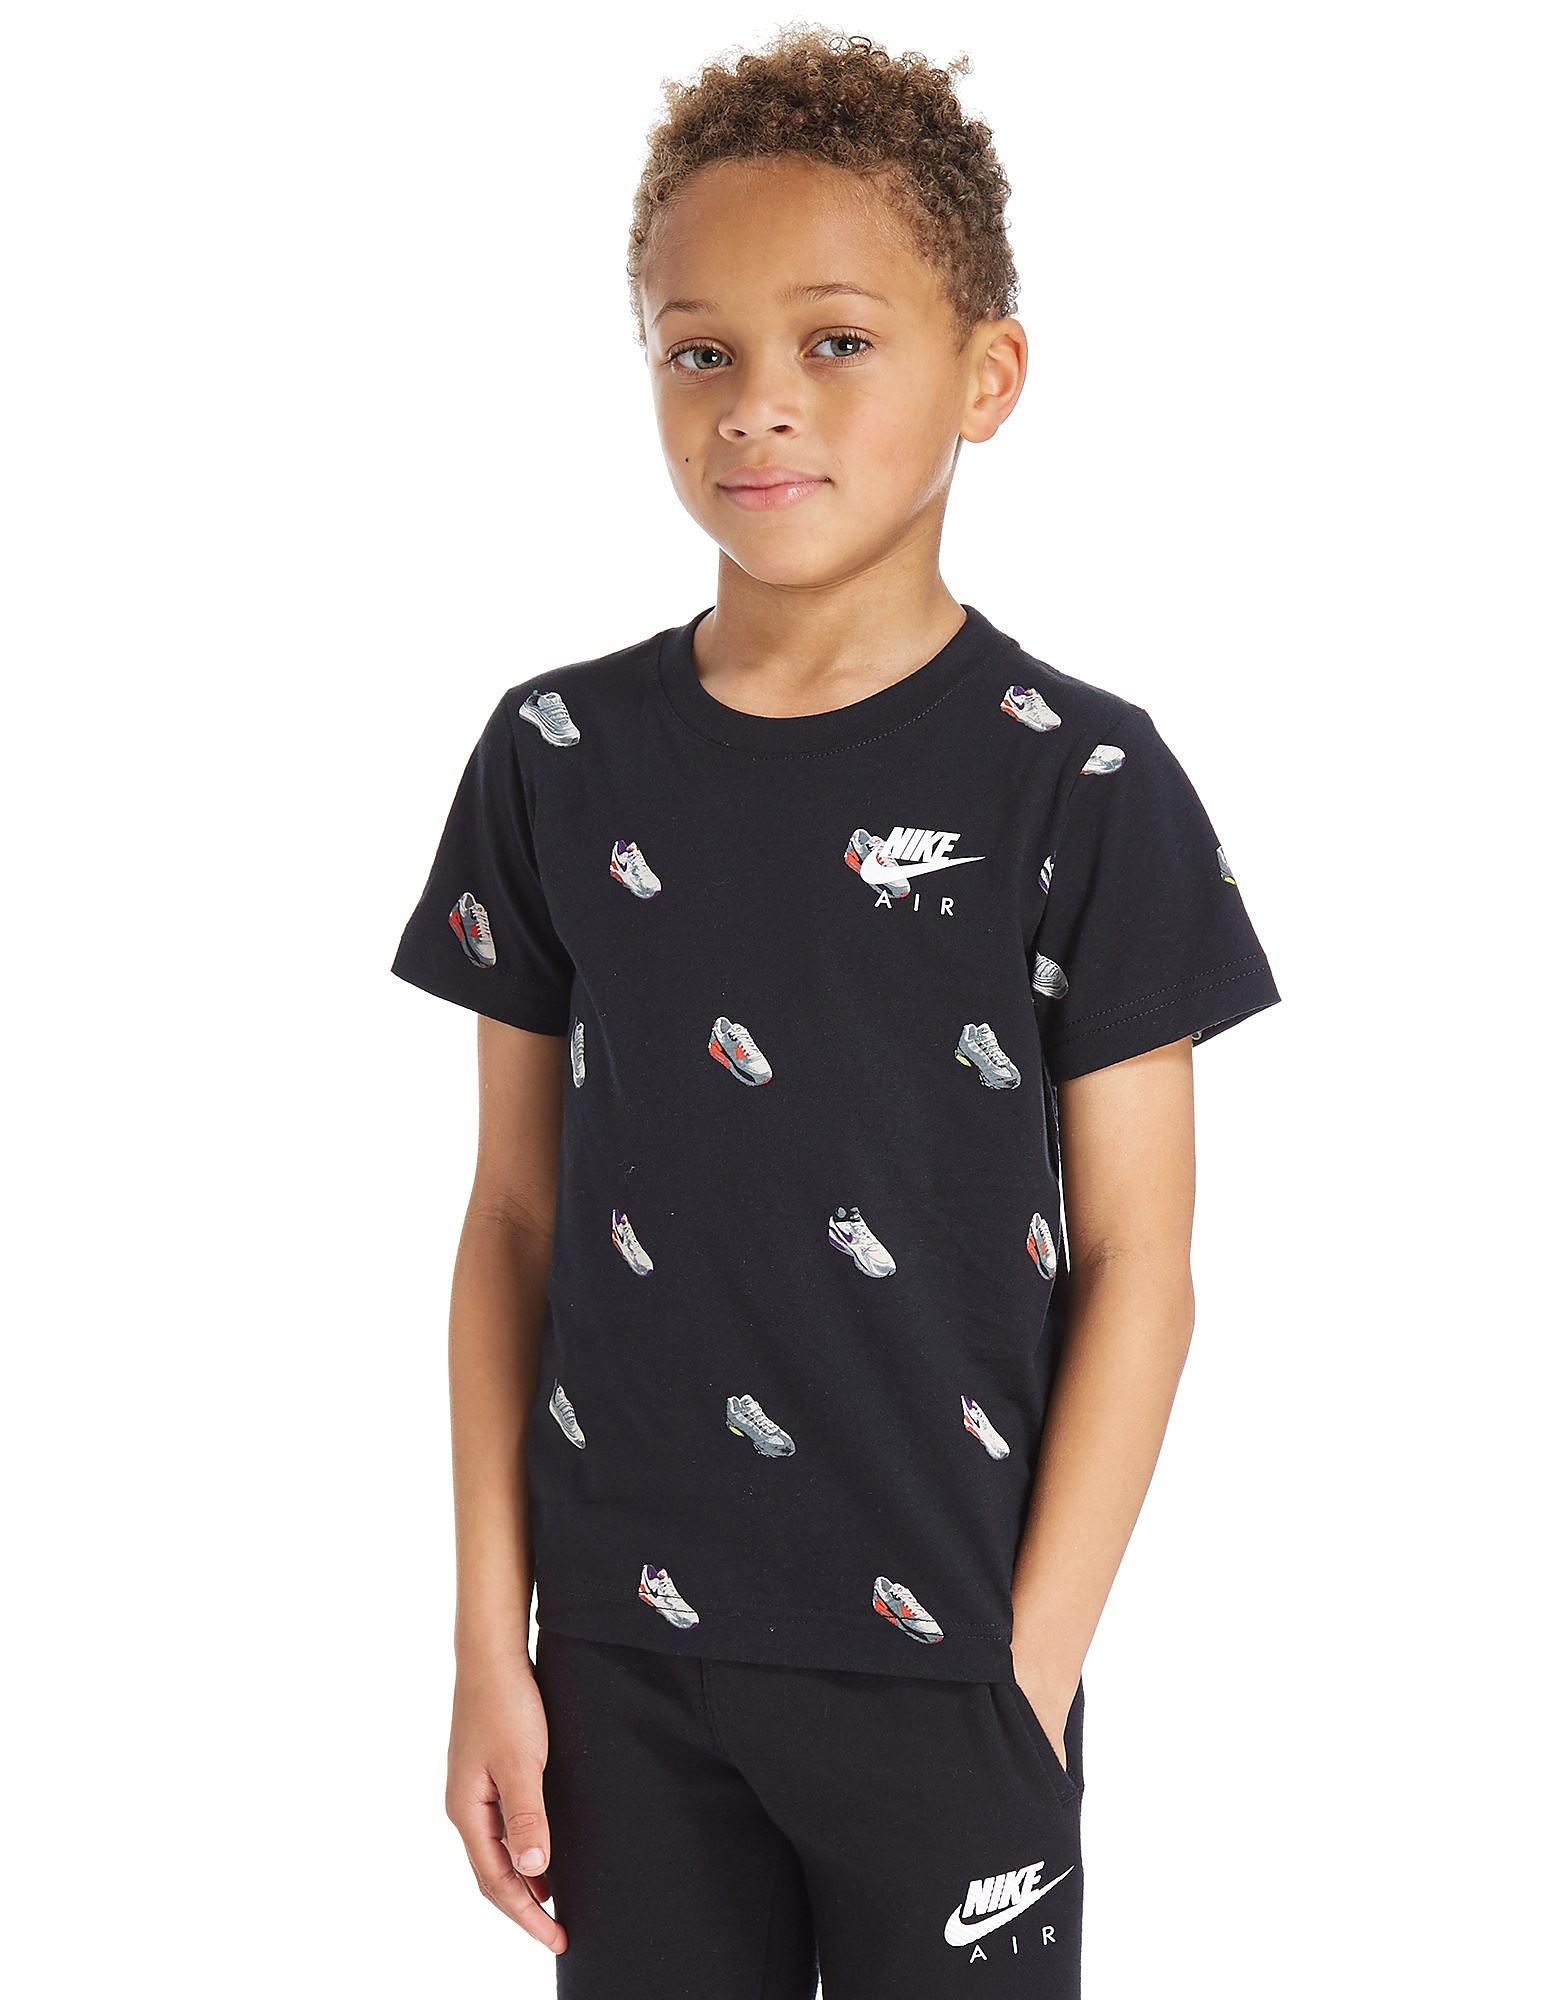 Nike Air Schuh-Druck T-Shirt Kinder